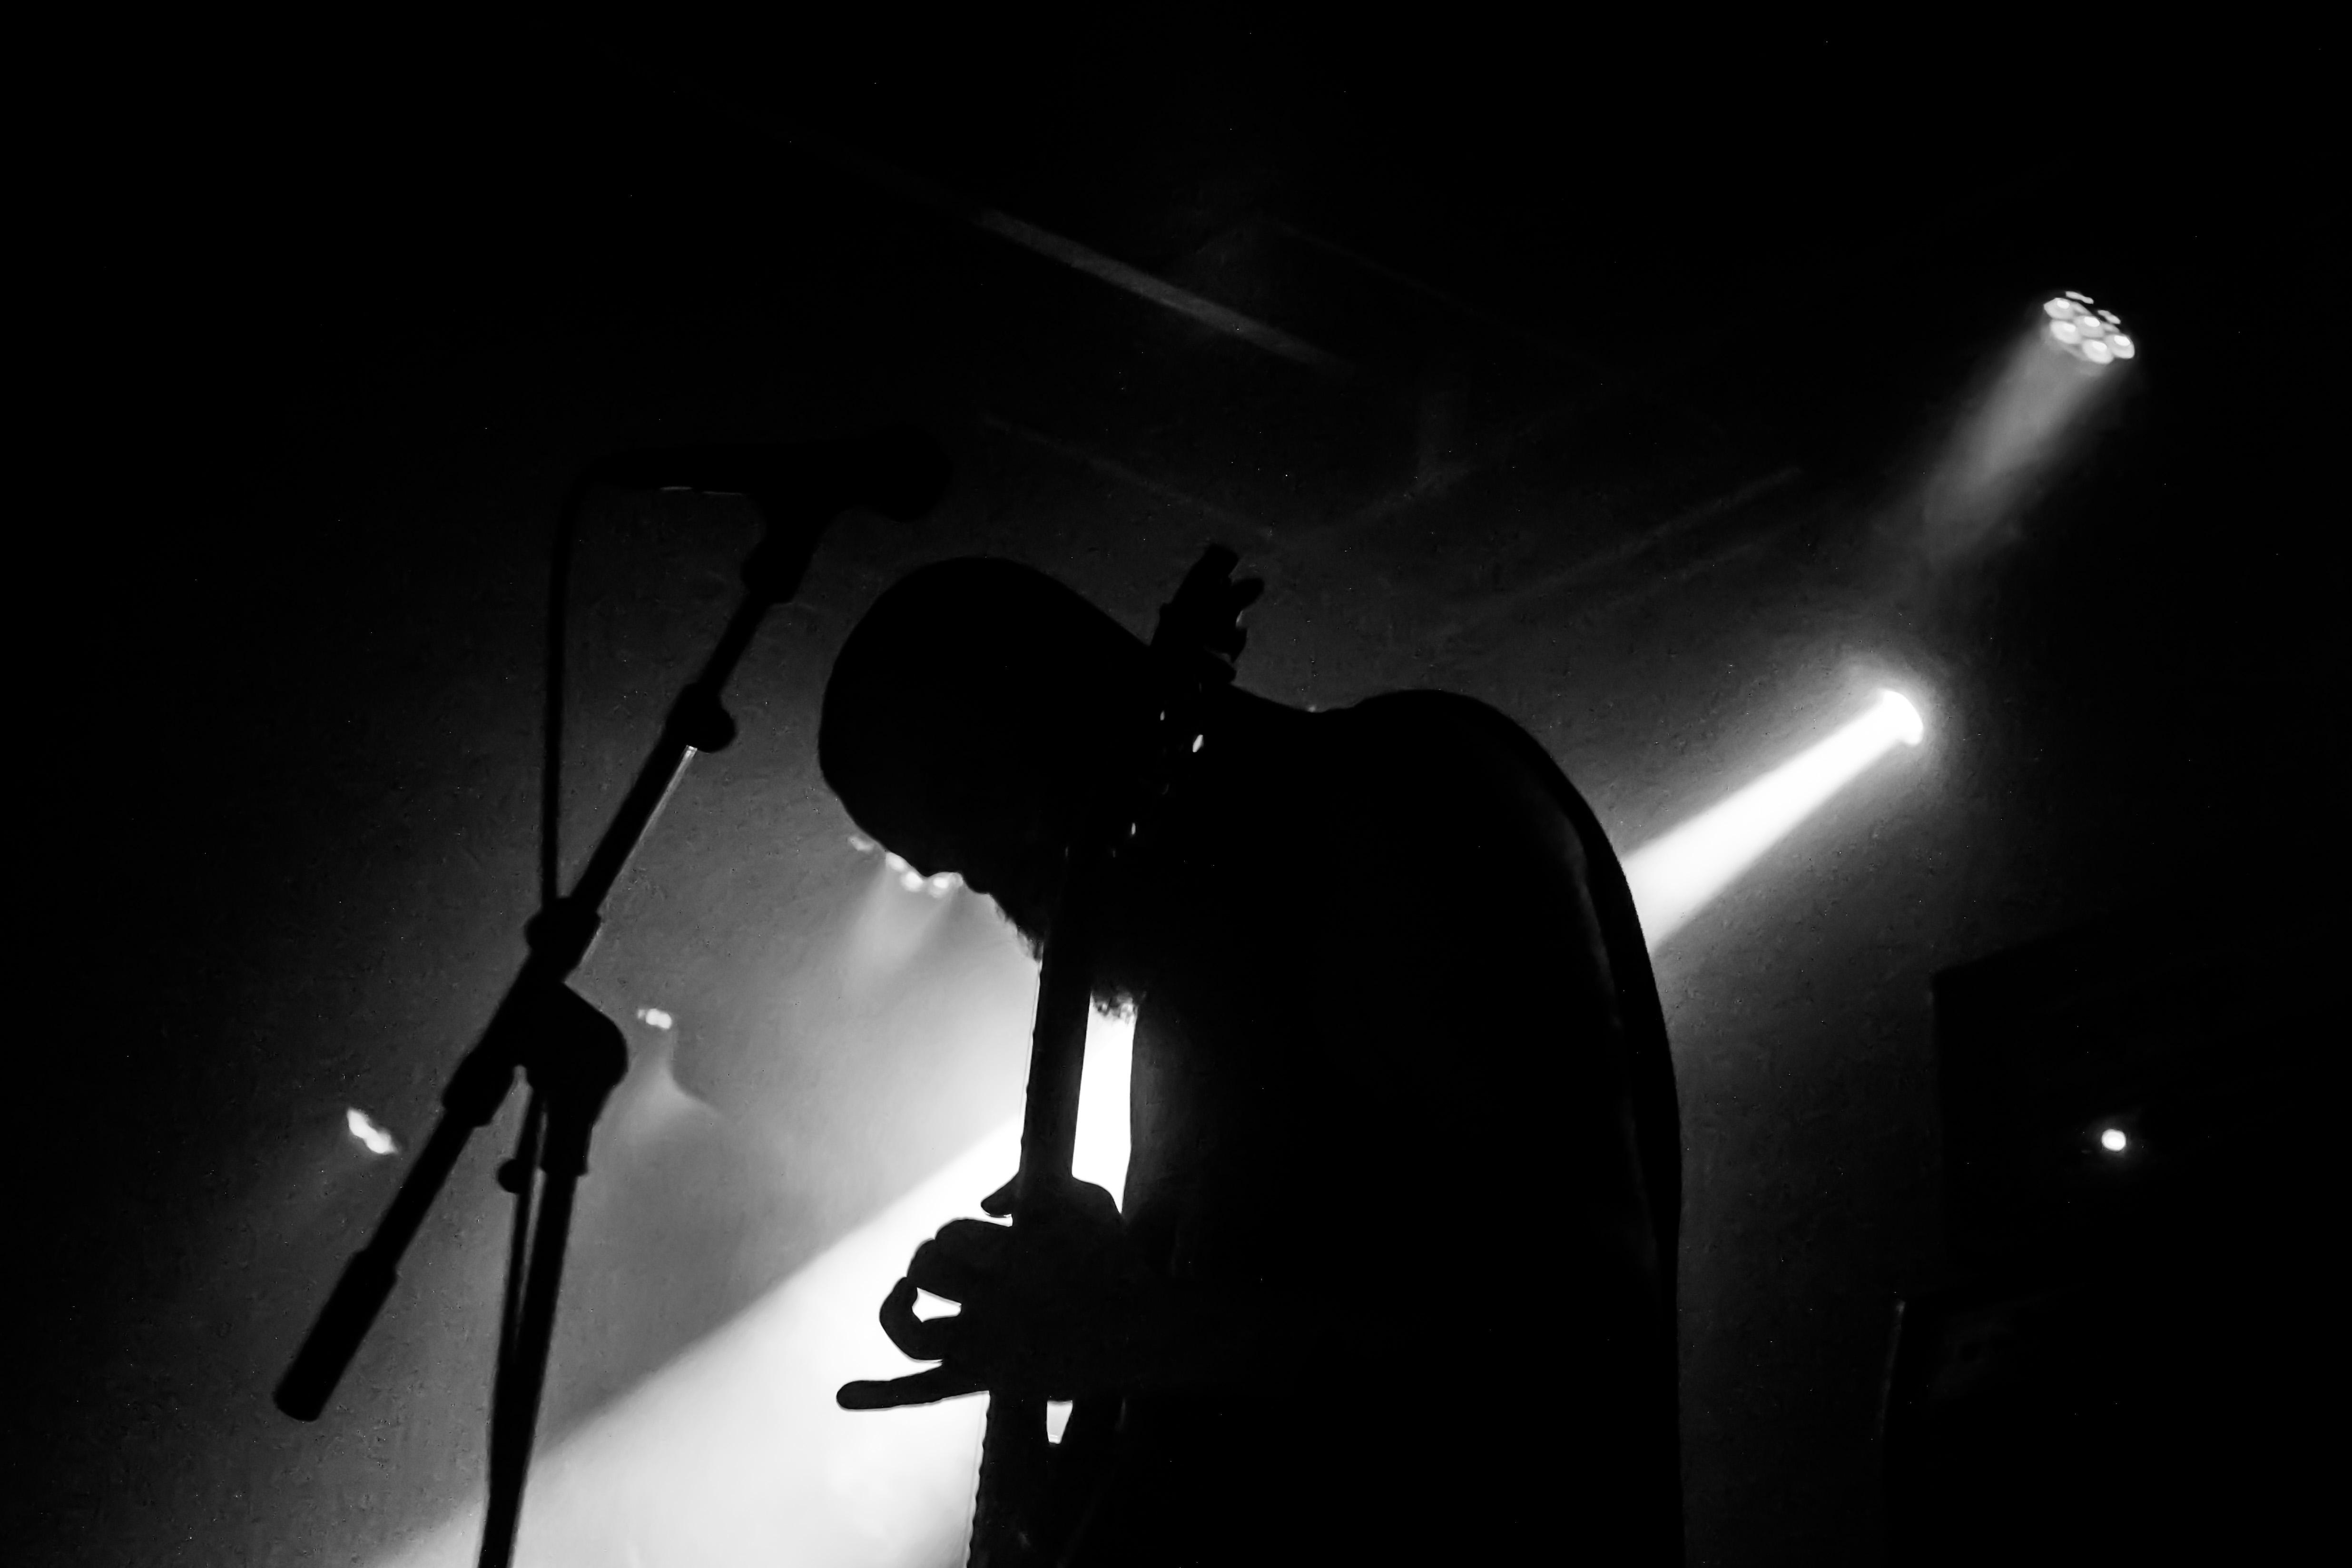 Wiegedood. Fotografia: Sofia Silva